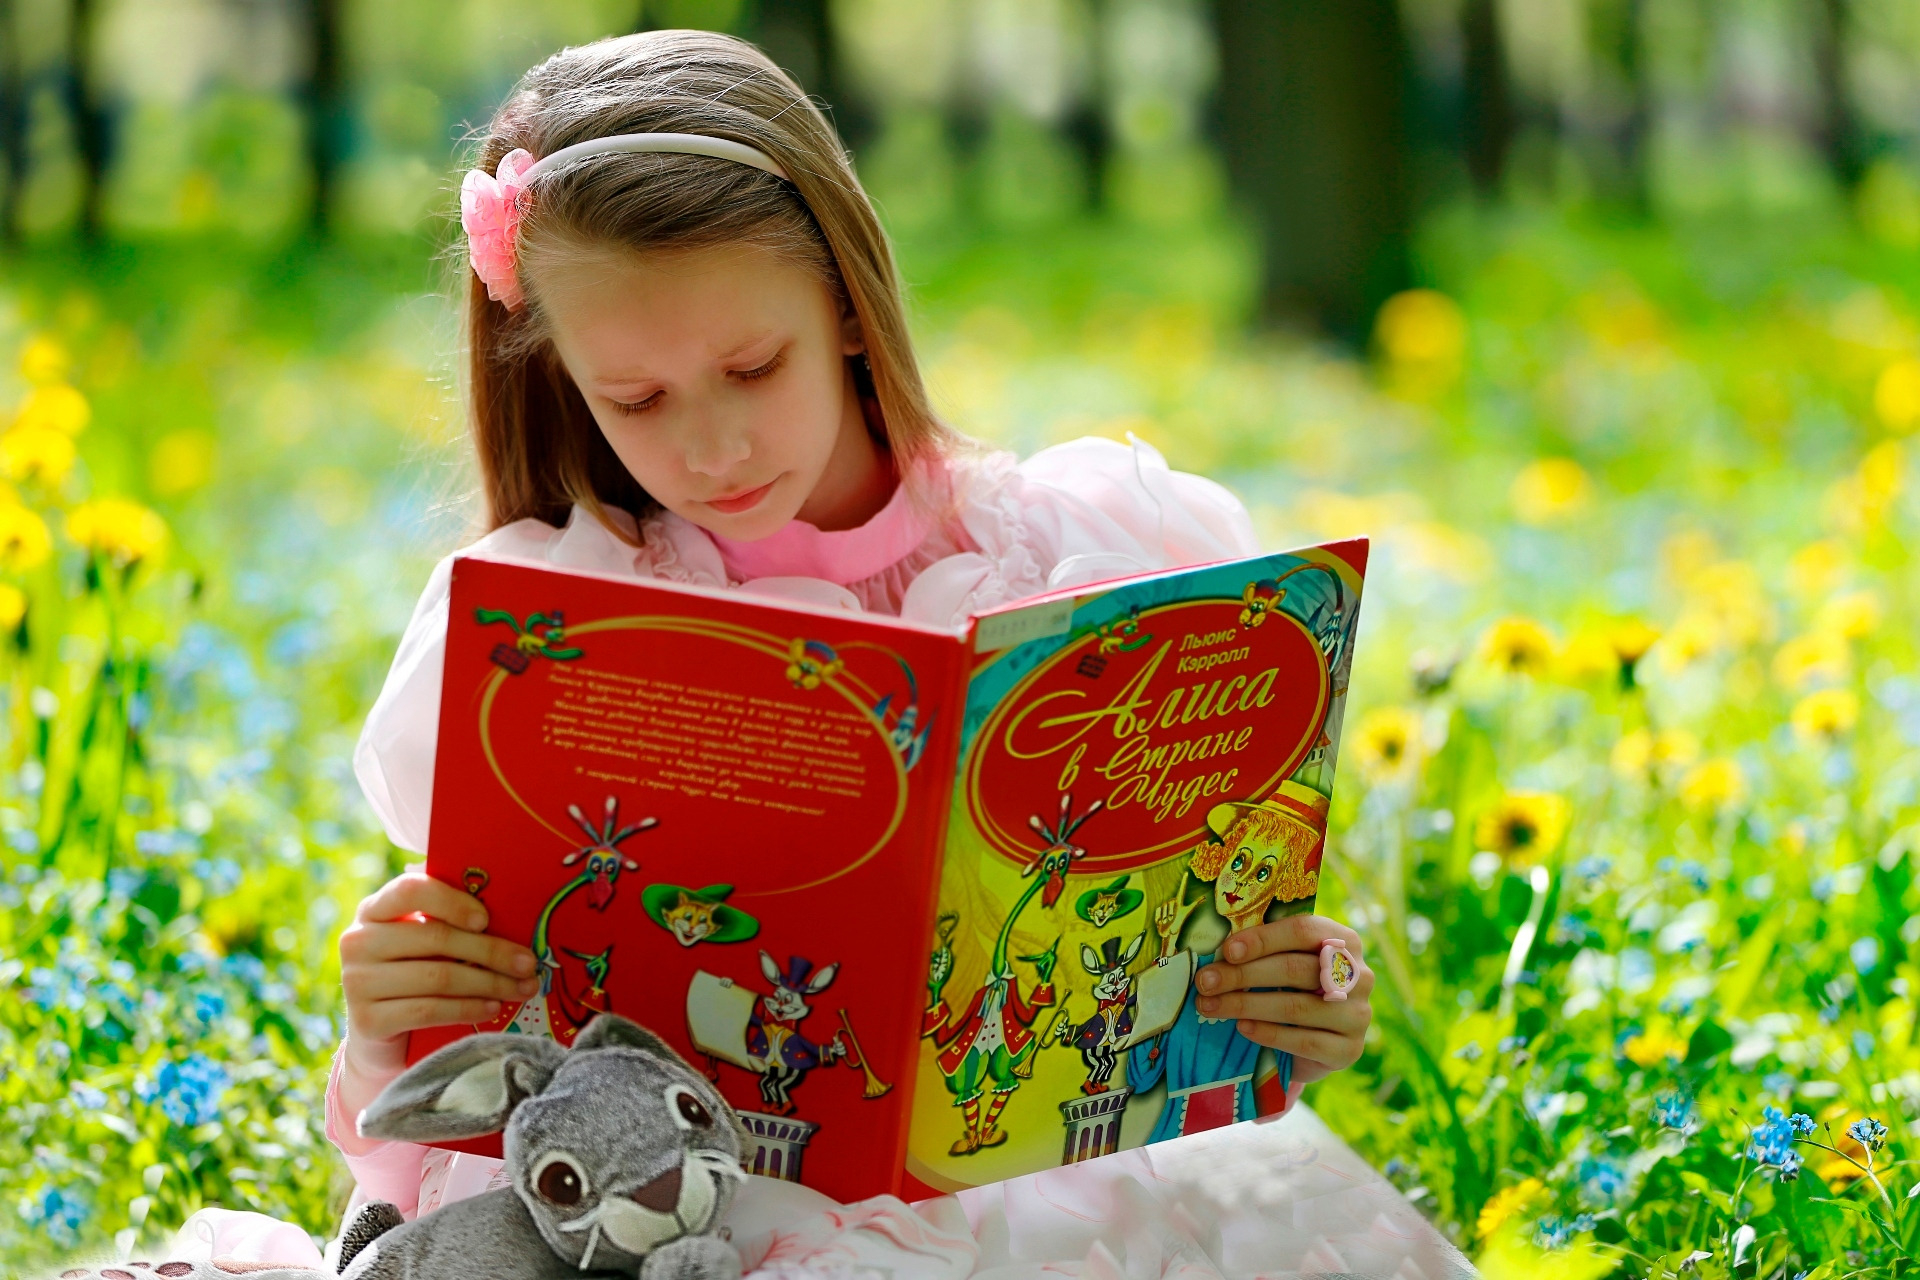 клетки картинки до дитячих книжок монстер евер